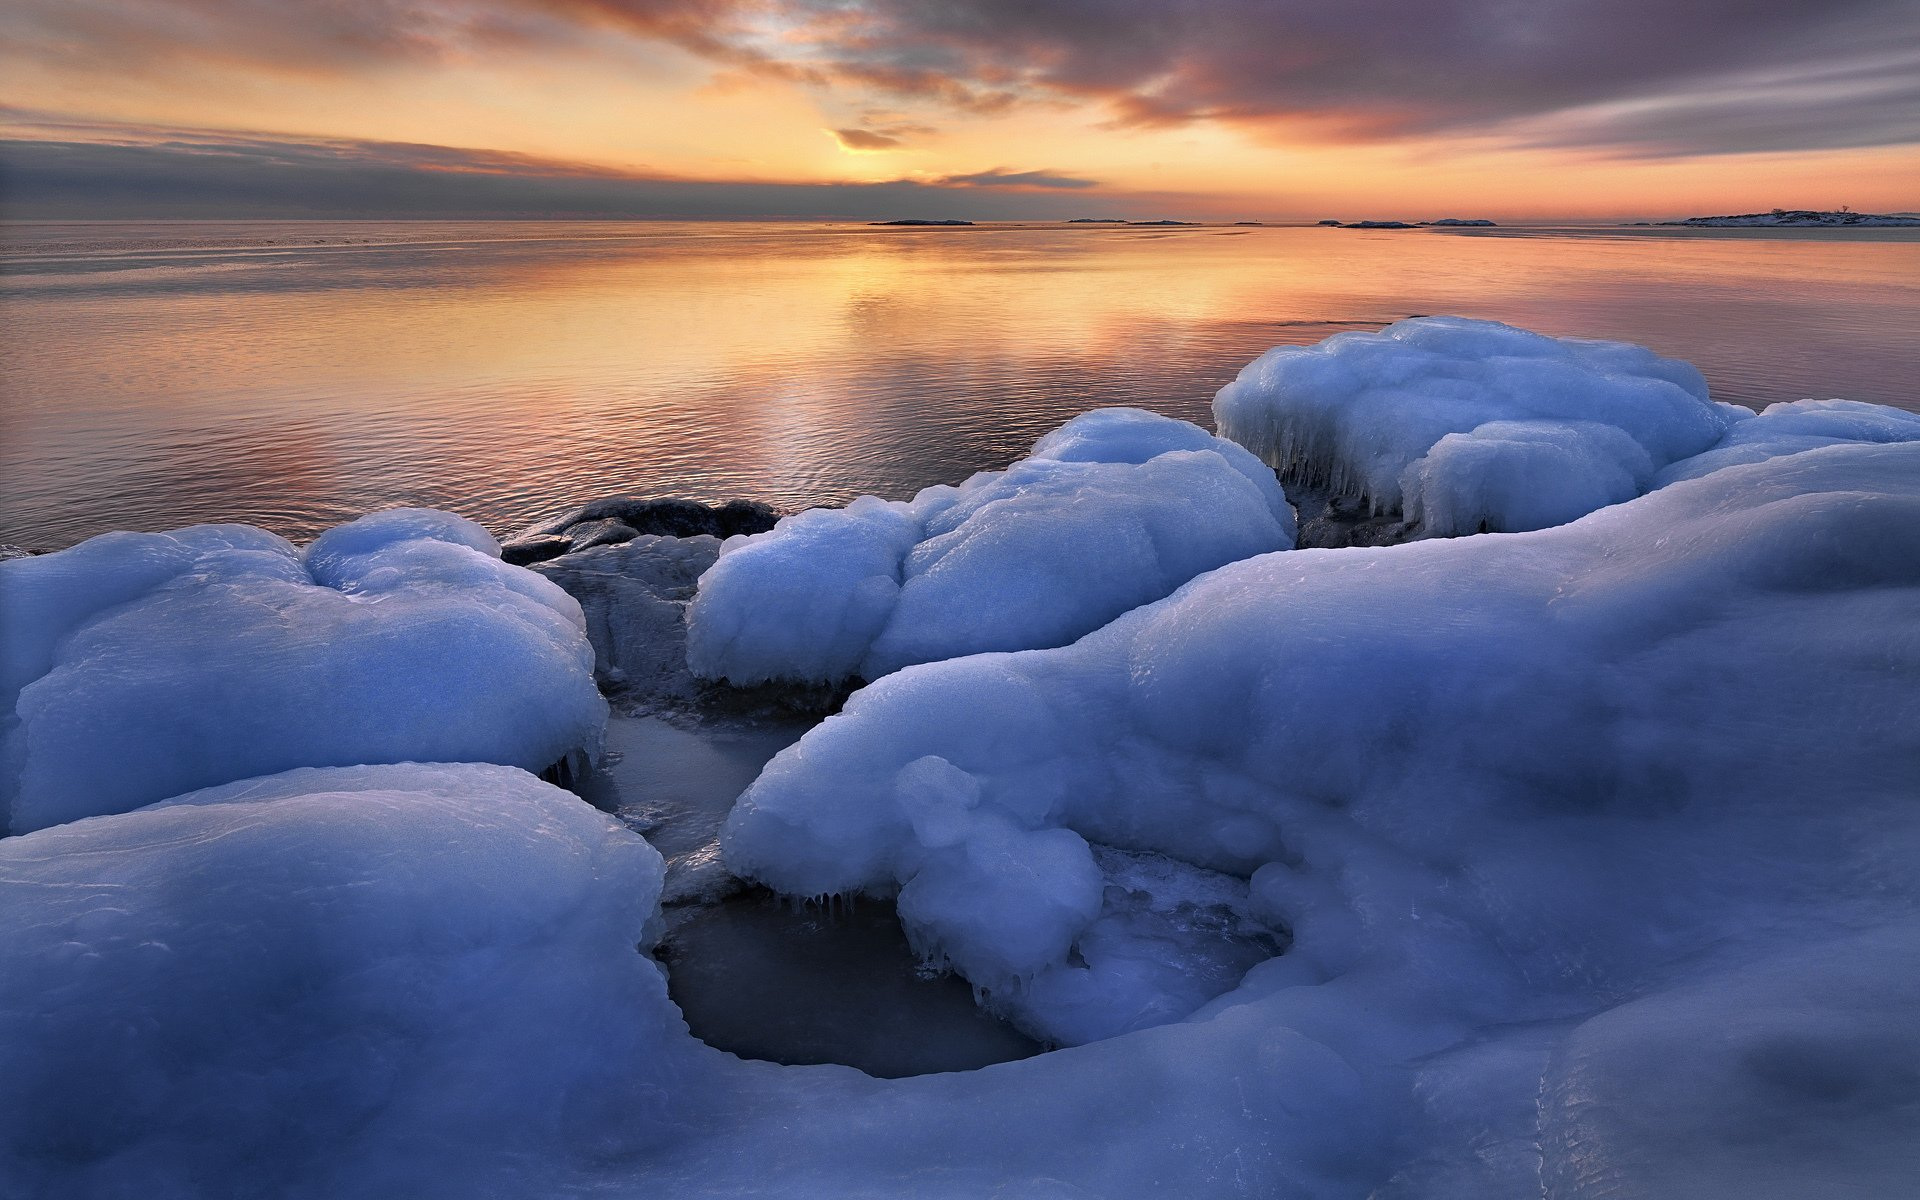 природа водопад снег небо облака зима без смс